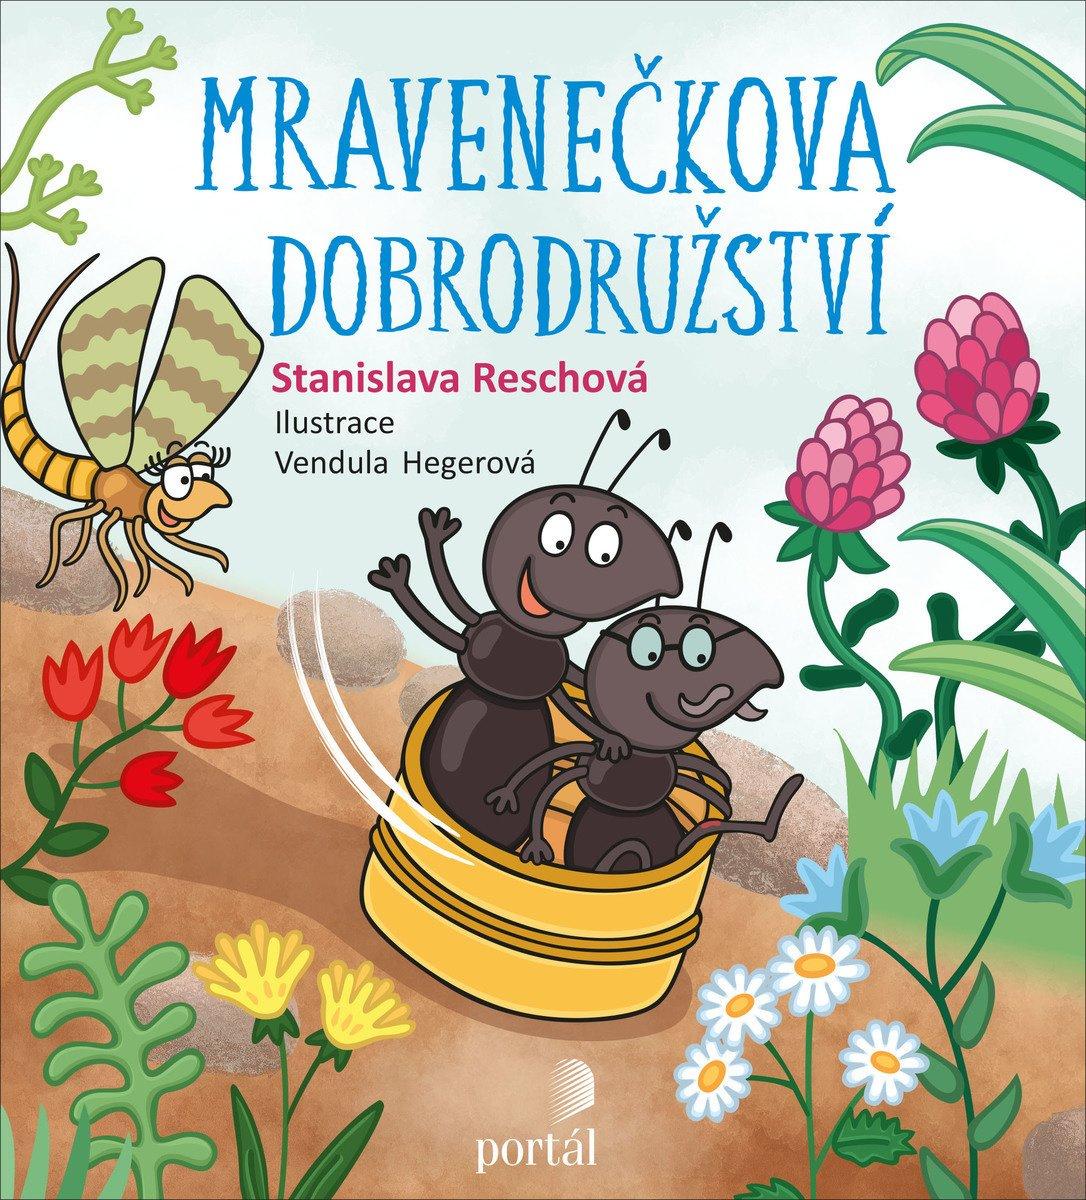 Mravenečkova dobrodružství, Stanislava Reschová